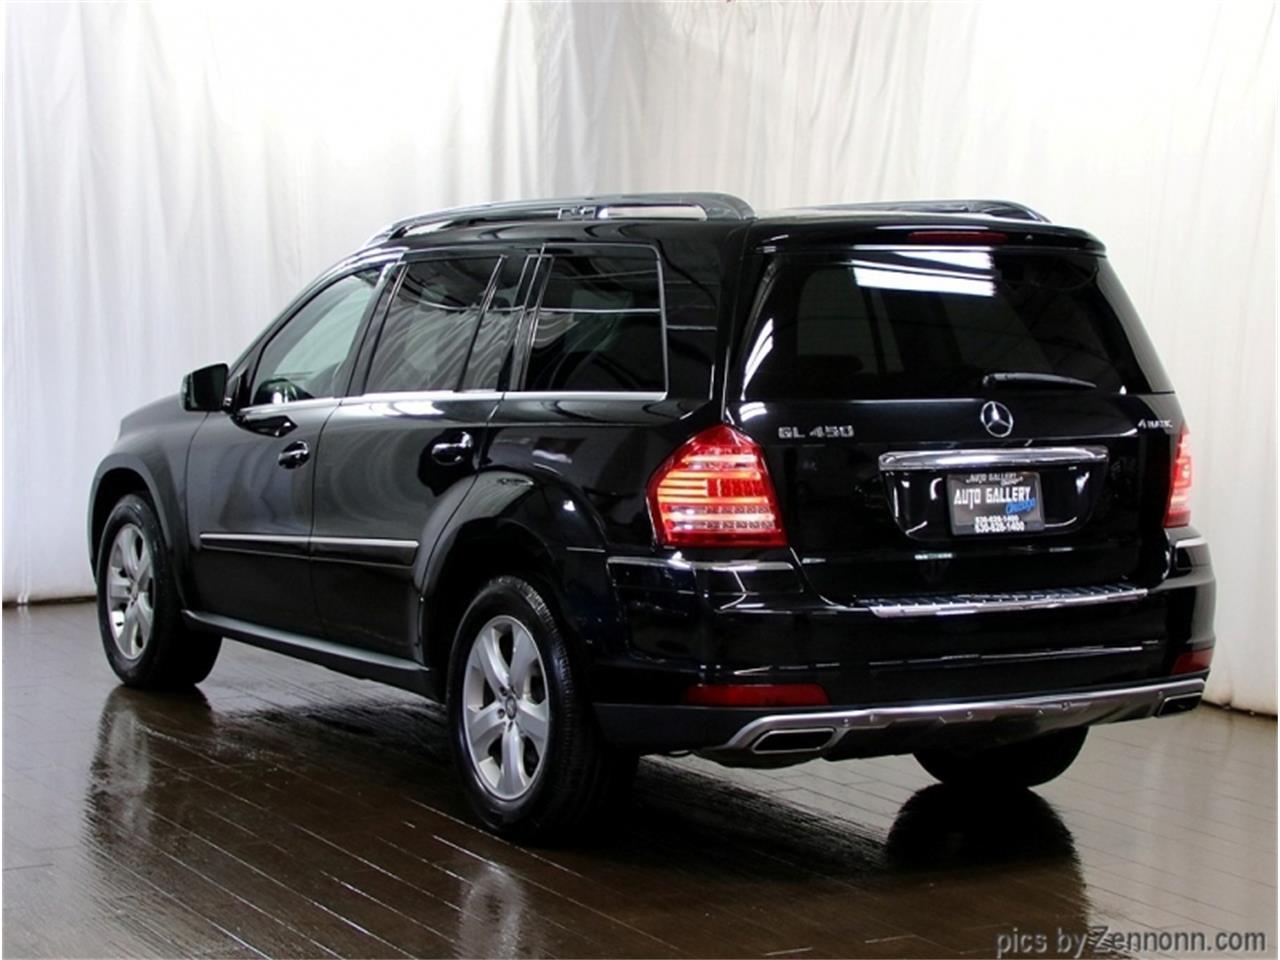 2011 Mercedes-Benz GL450 (CC-1379554) for sale in Addison, Illinois